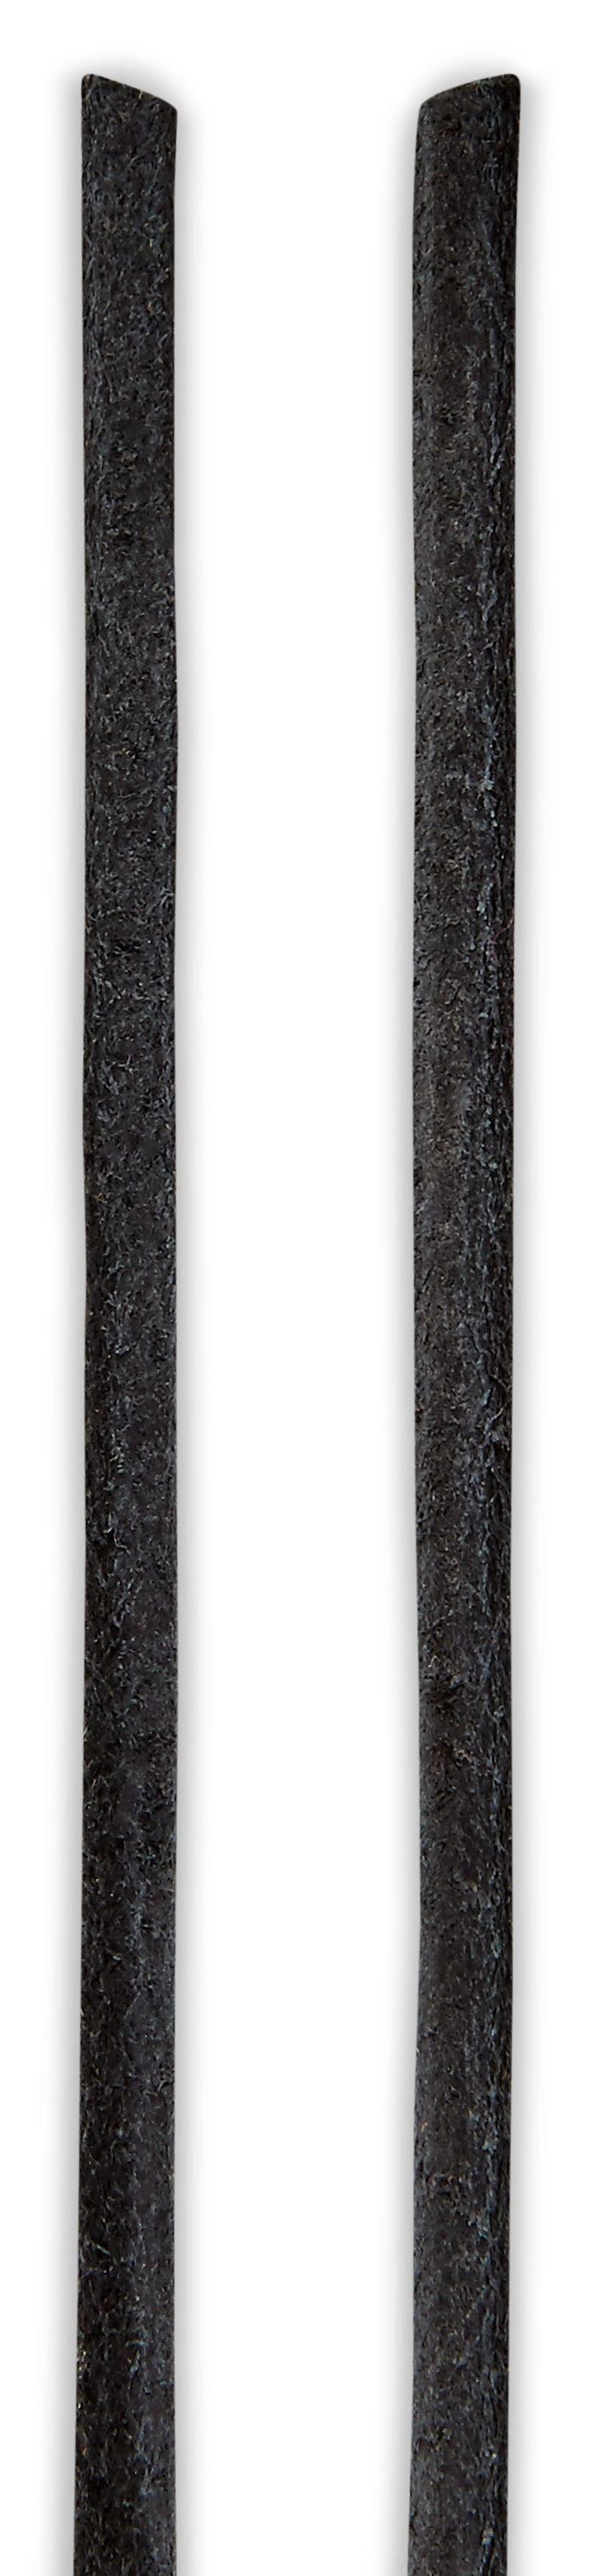 Leather Lace round (Nero)